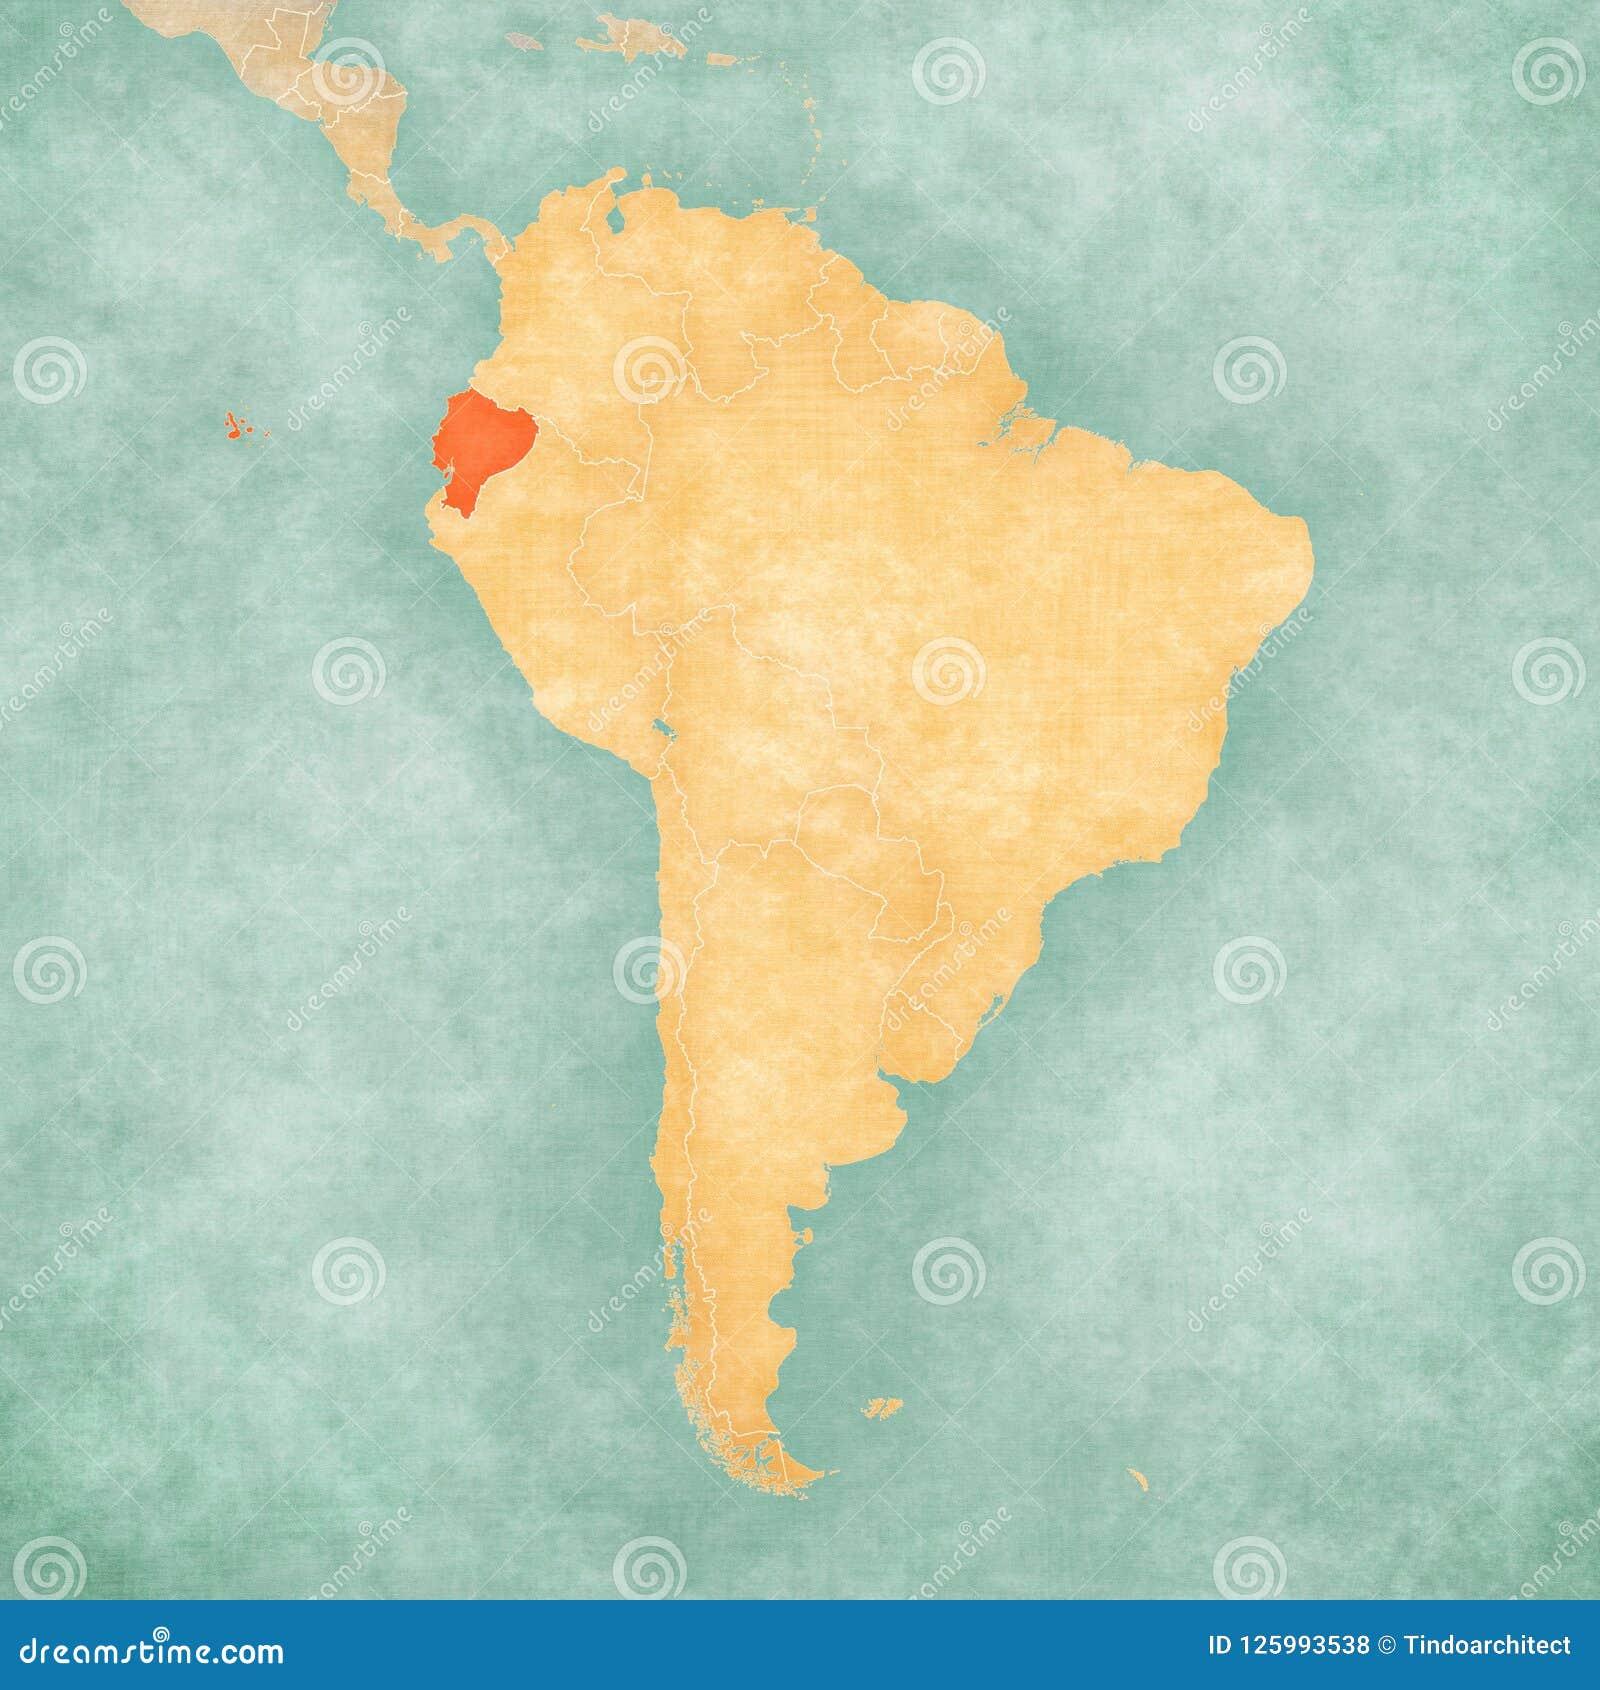 South America Map Ecuador.Map Of South America Ecuador Stock Illustration Illustration Of